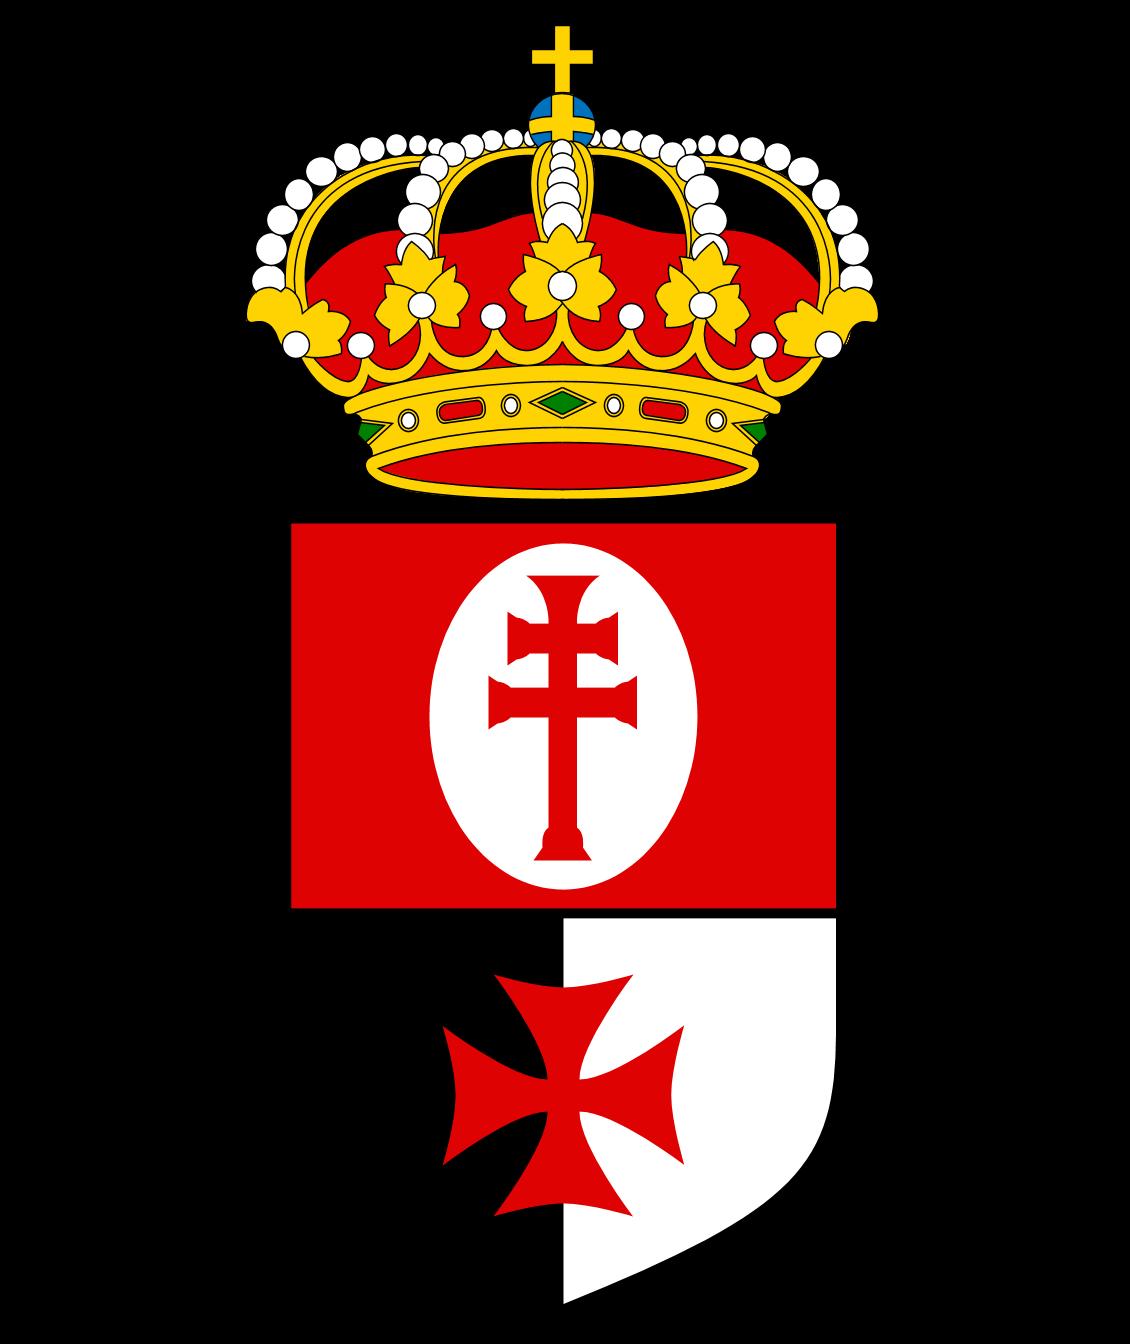 hsdct_logo_version simplificada coronada